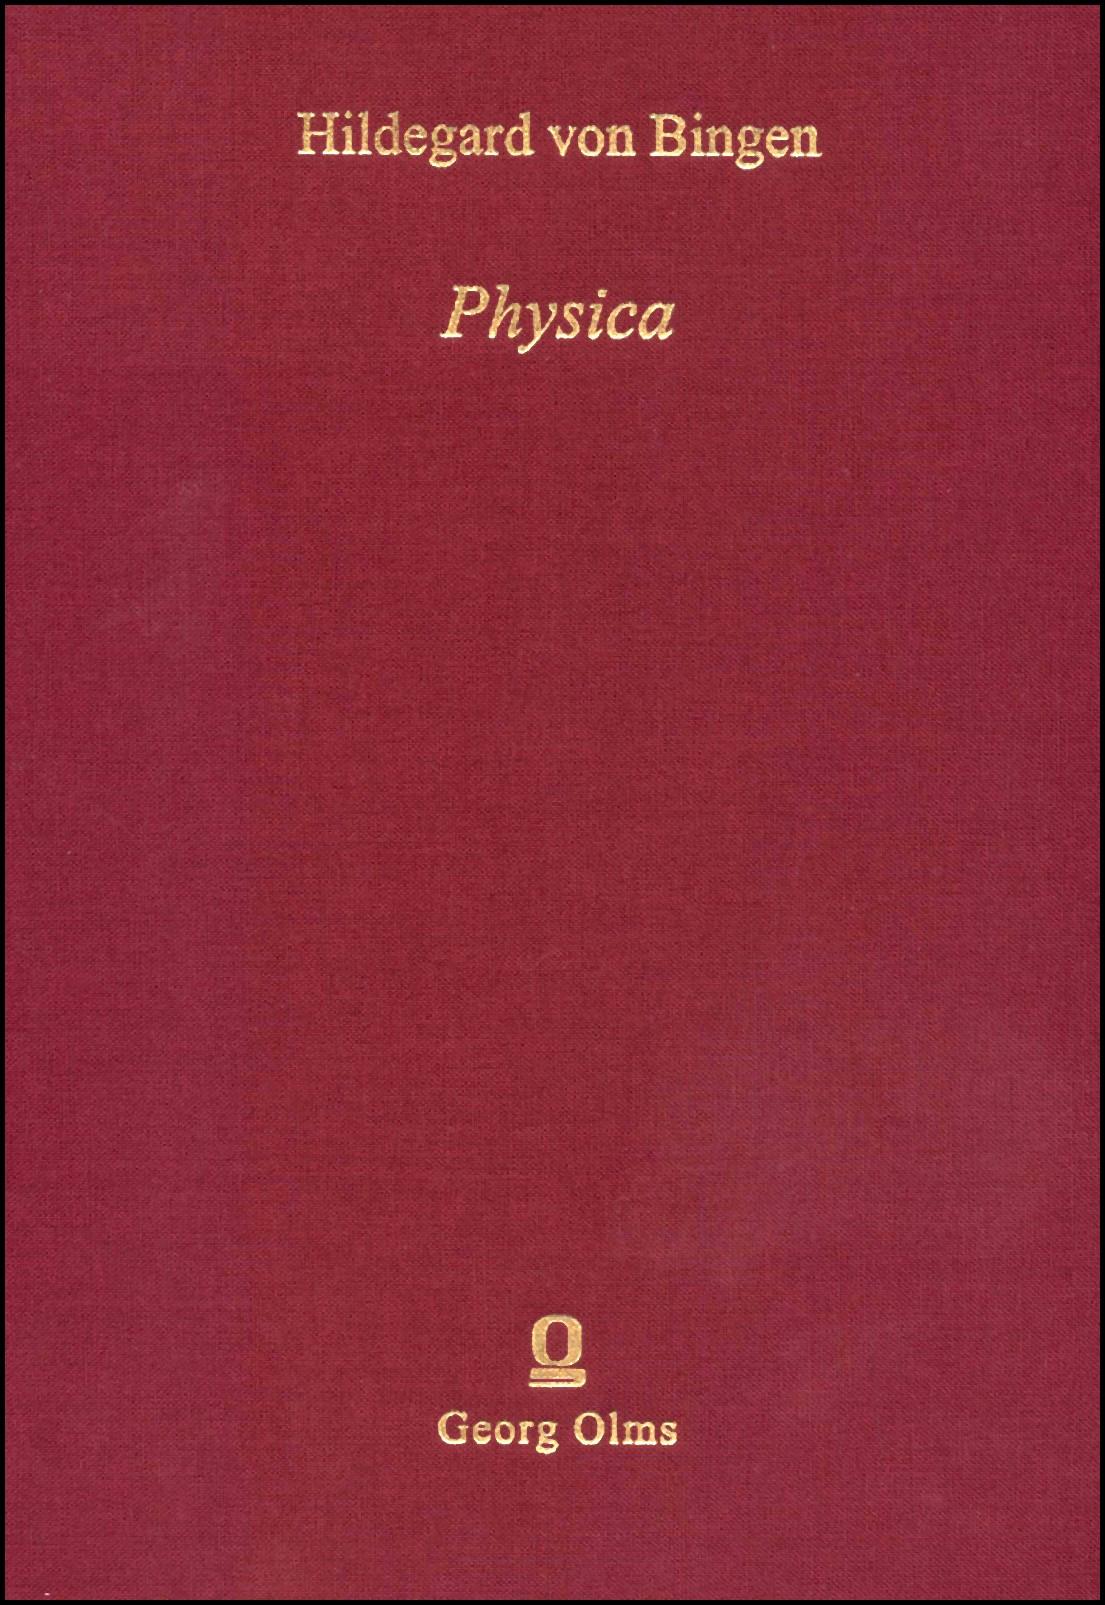 Physica | / Müller / Schulze, 2008 | Buch (Cover)